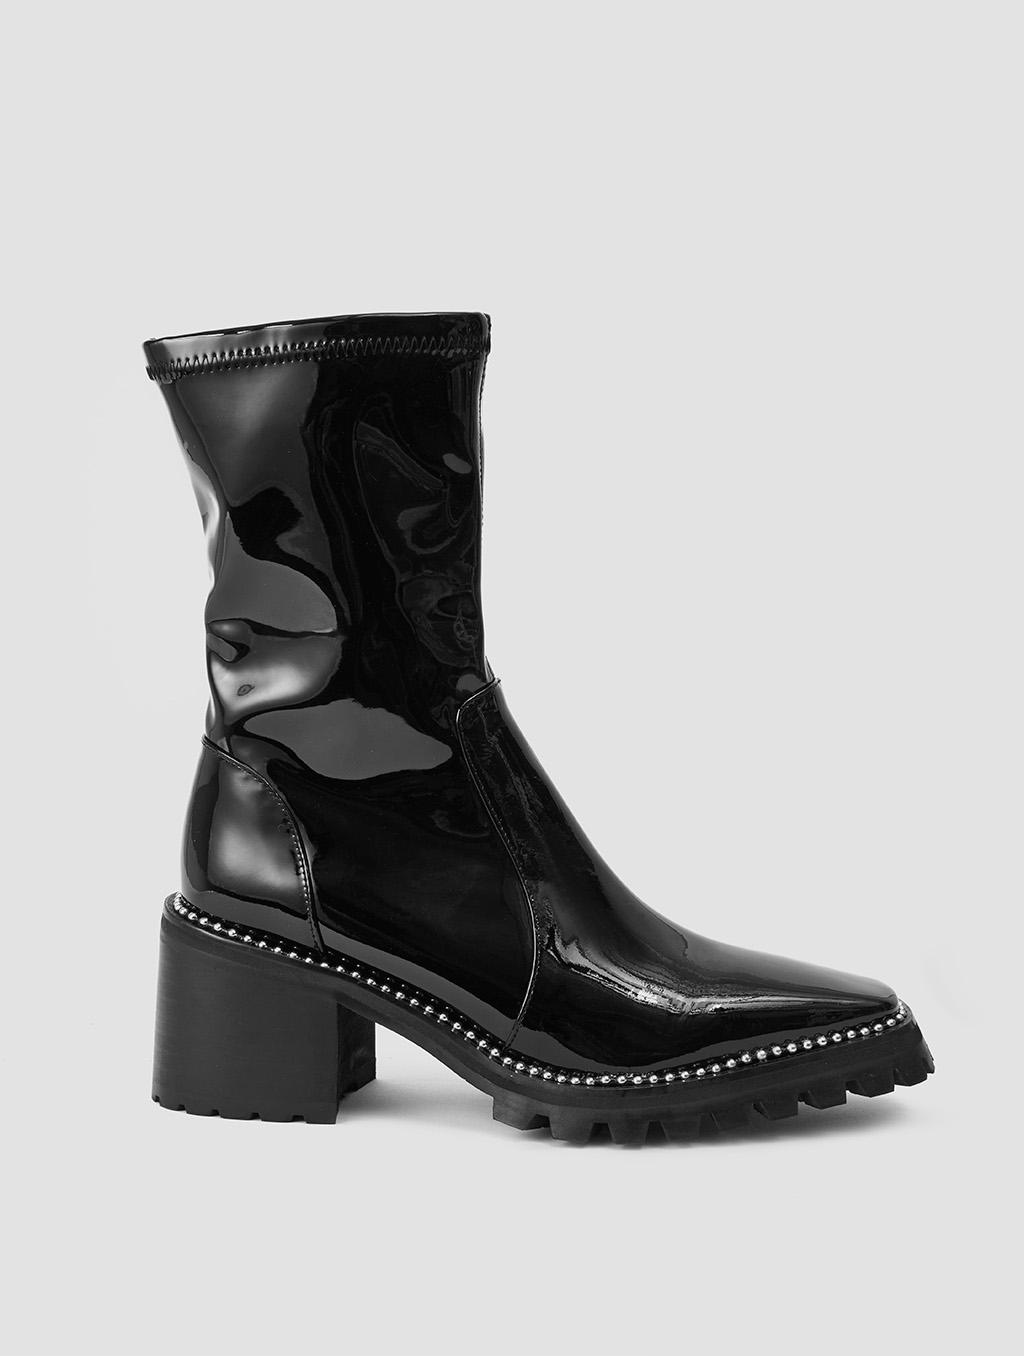 Silver Rhinestone Boots- positive- black